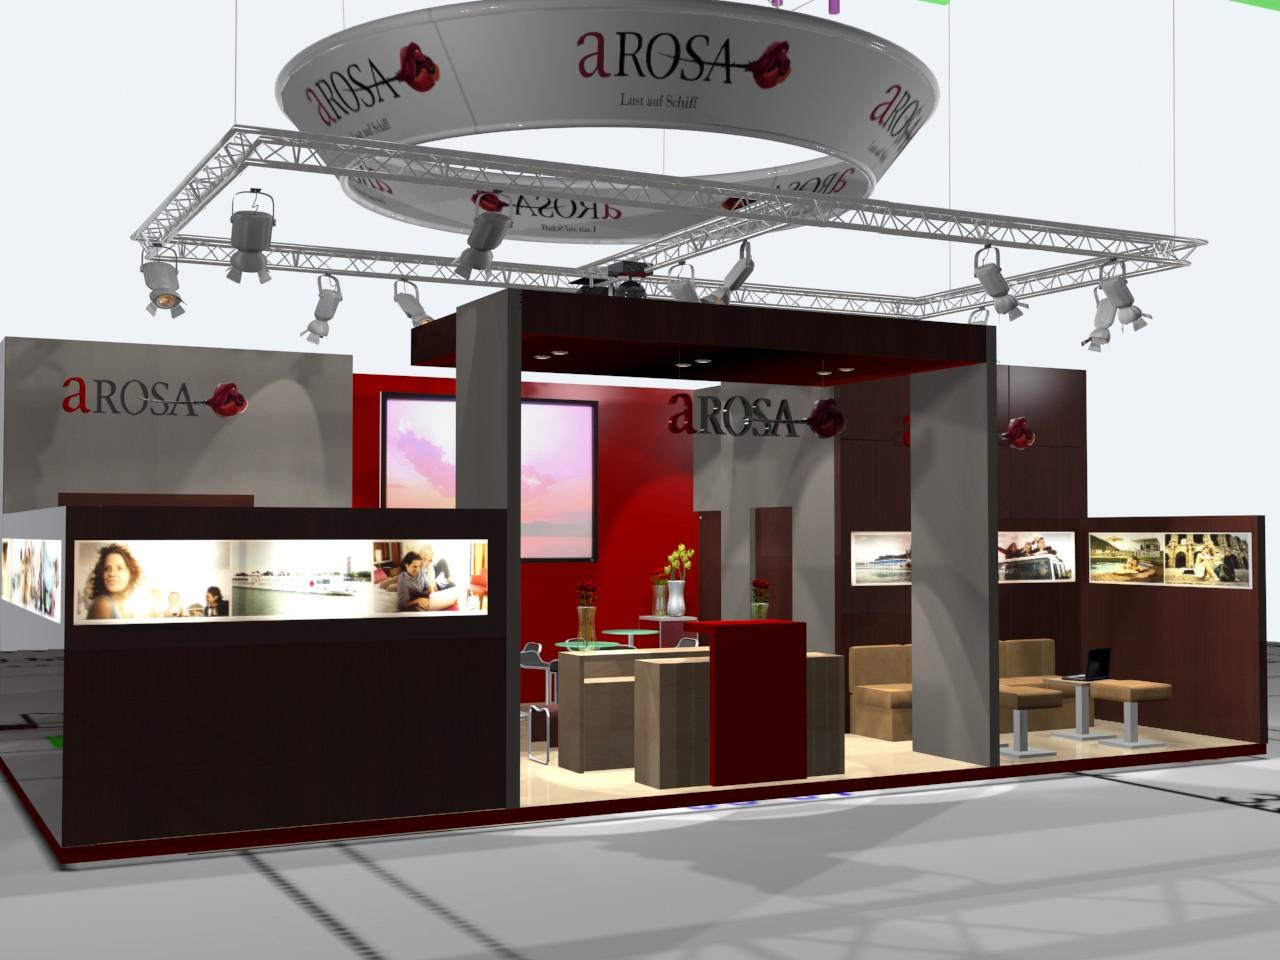 Arosa ITB 2012_3.1.002b